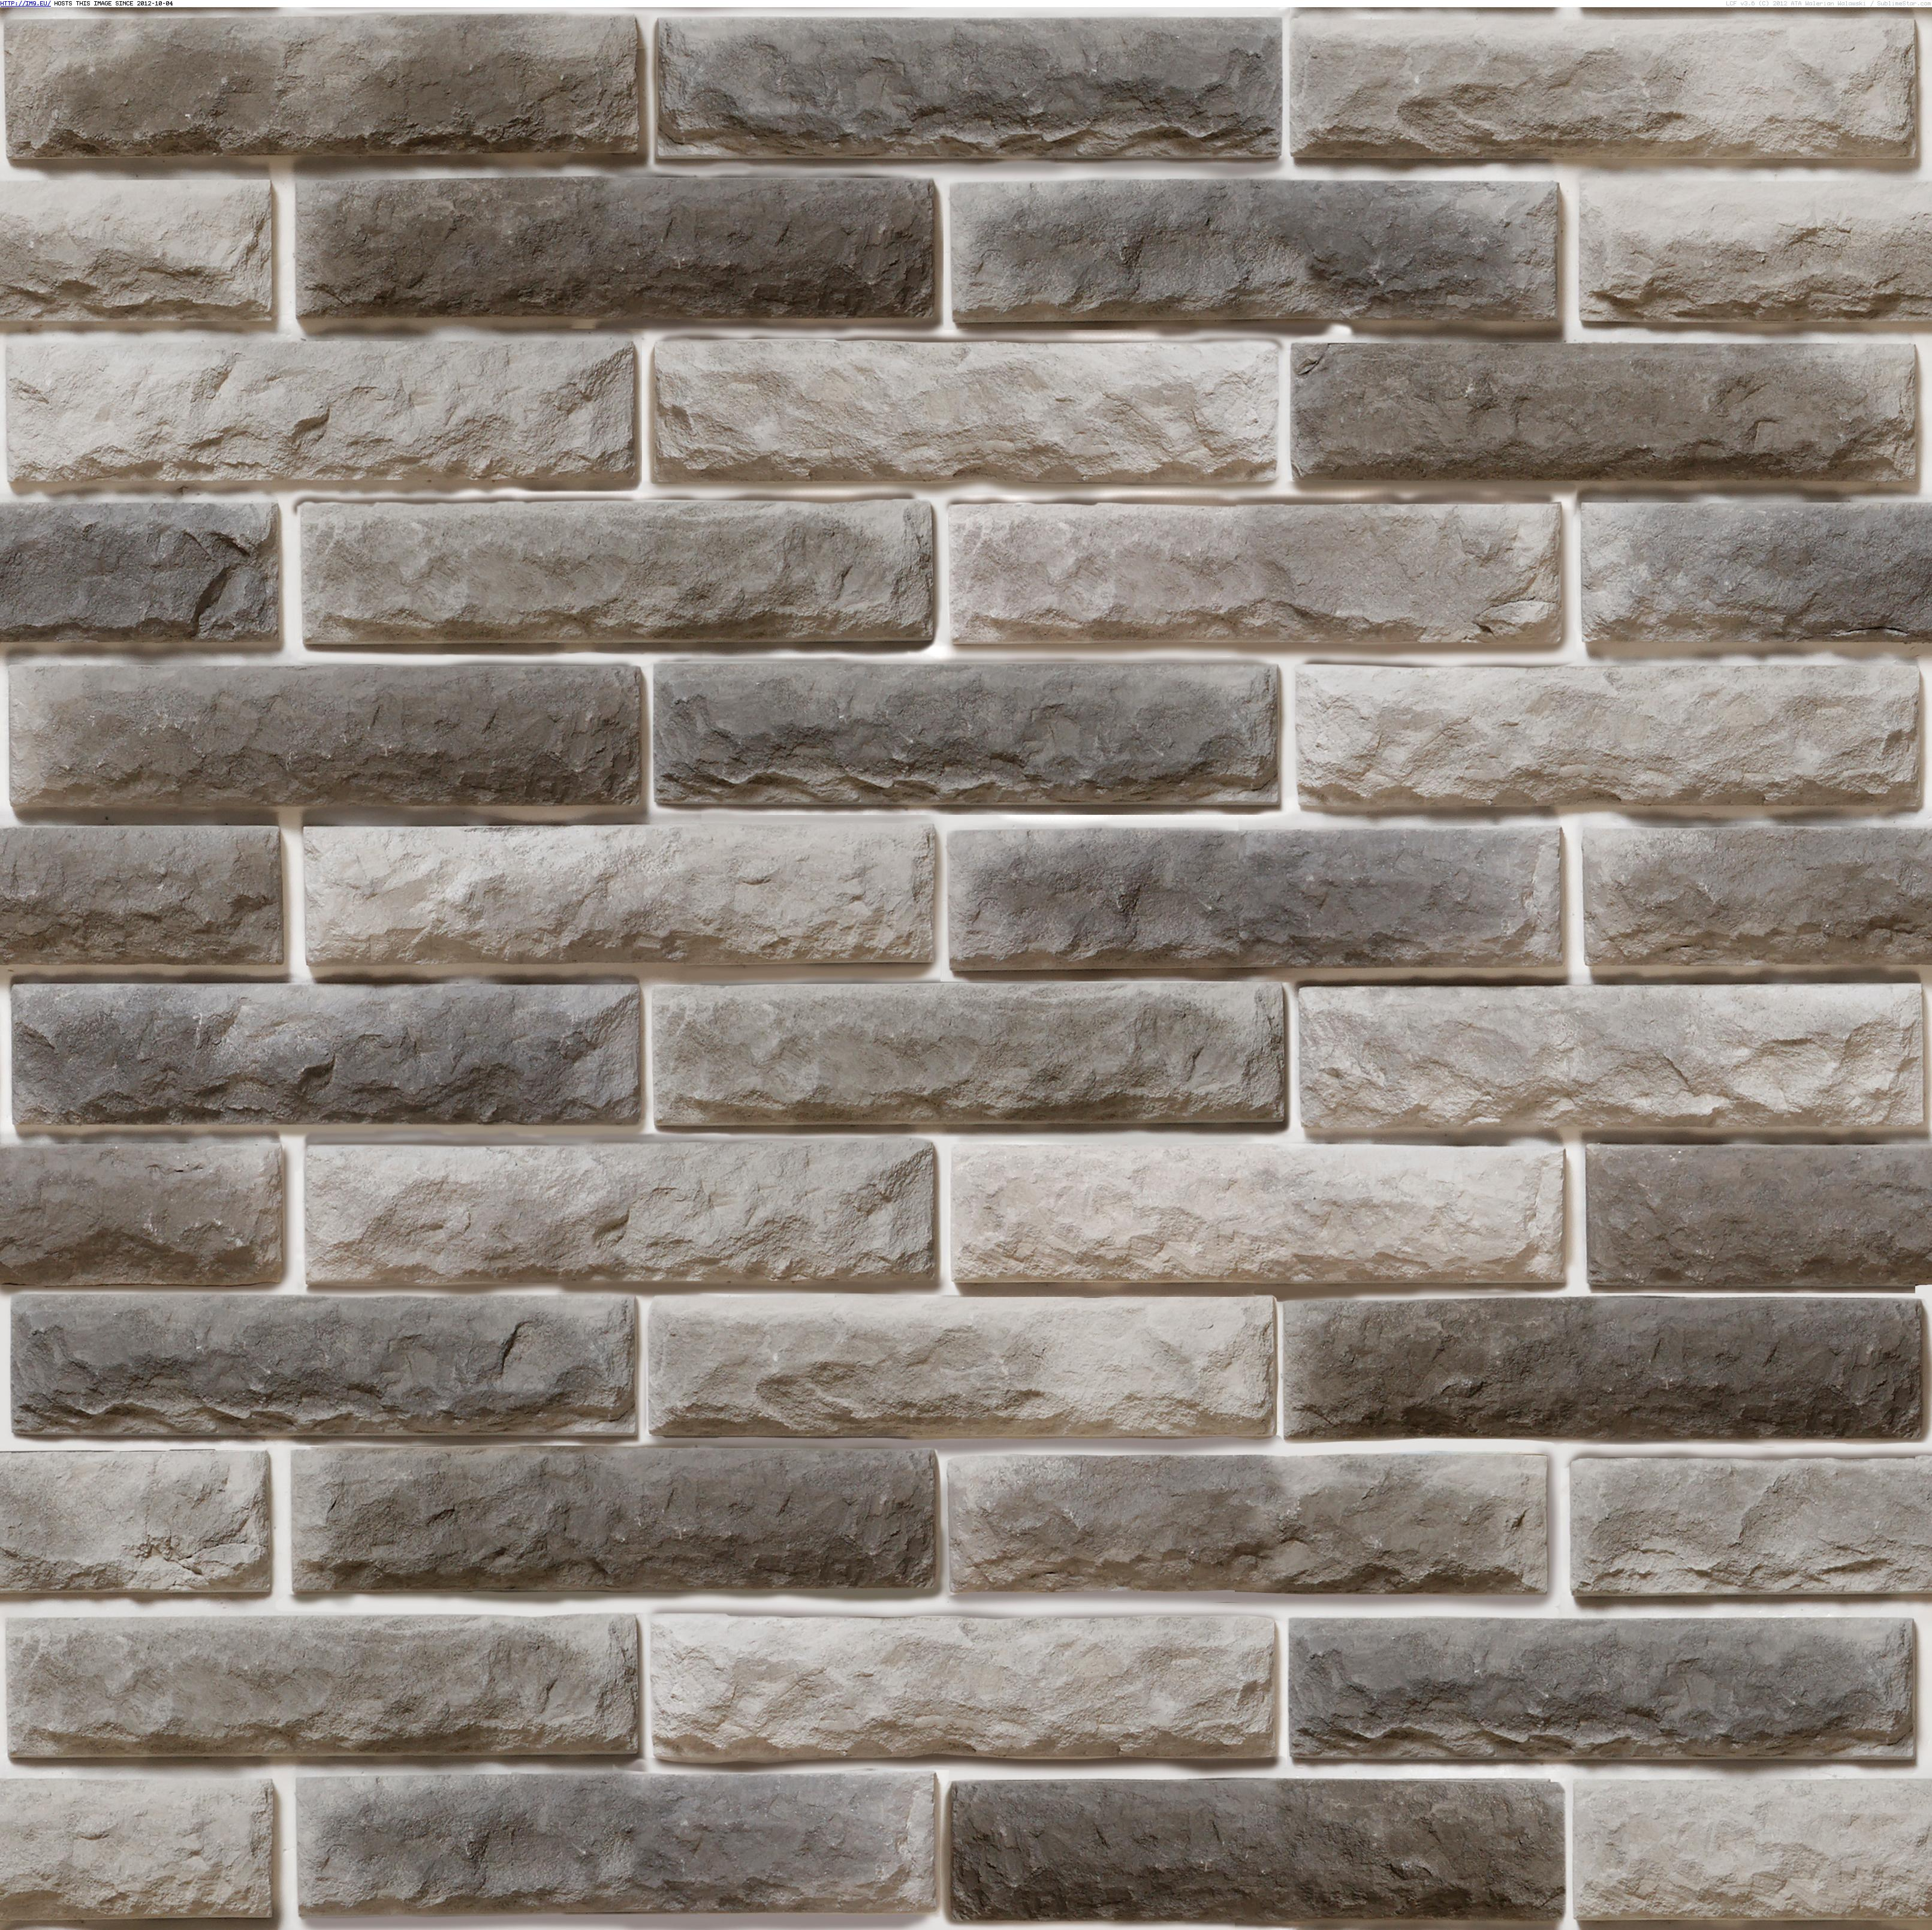 Brick Texture Images Crazy Gallery 3223x3219